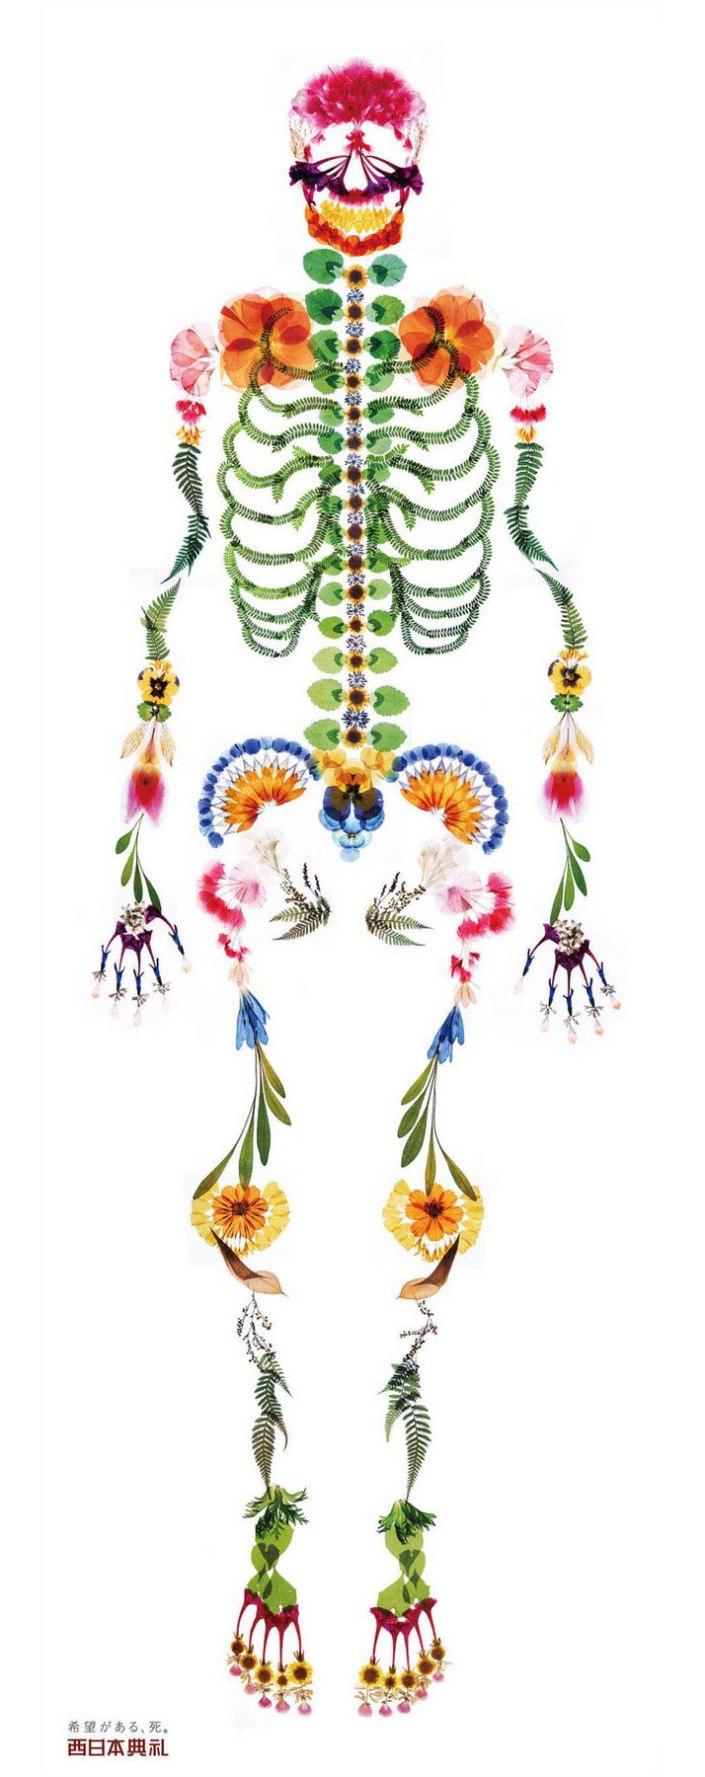 15-halloween-skulls-yatzer